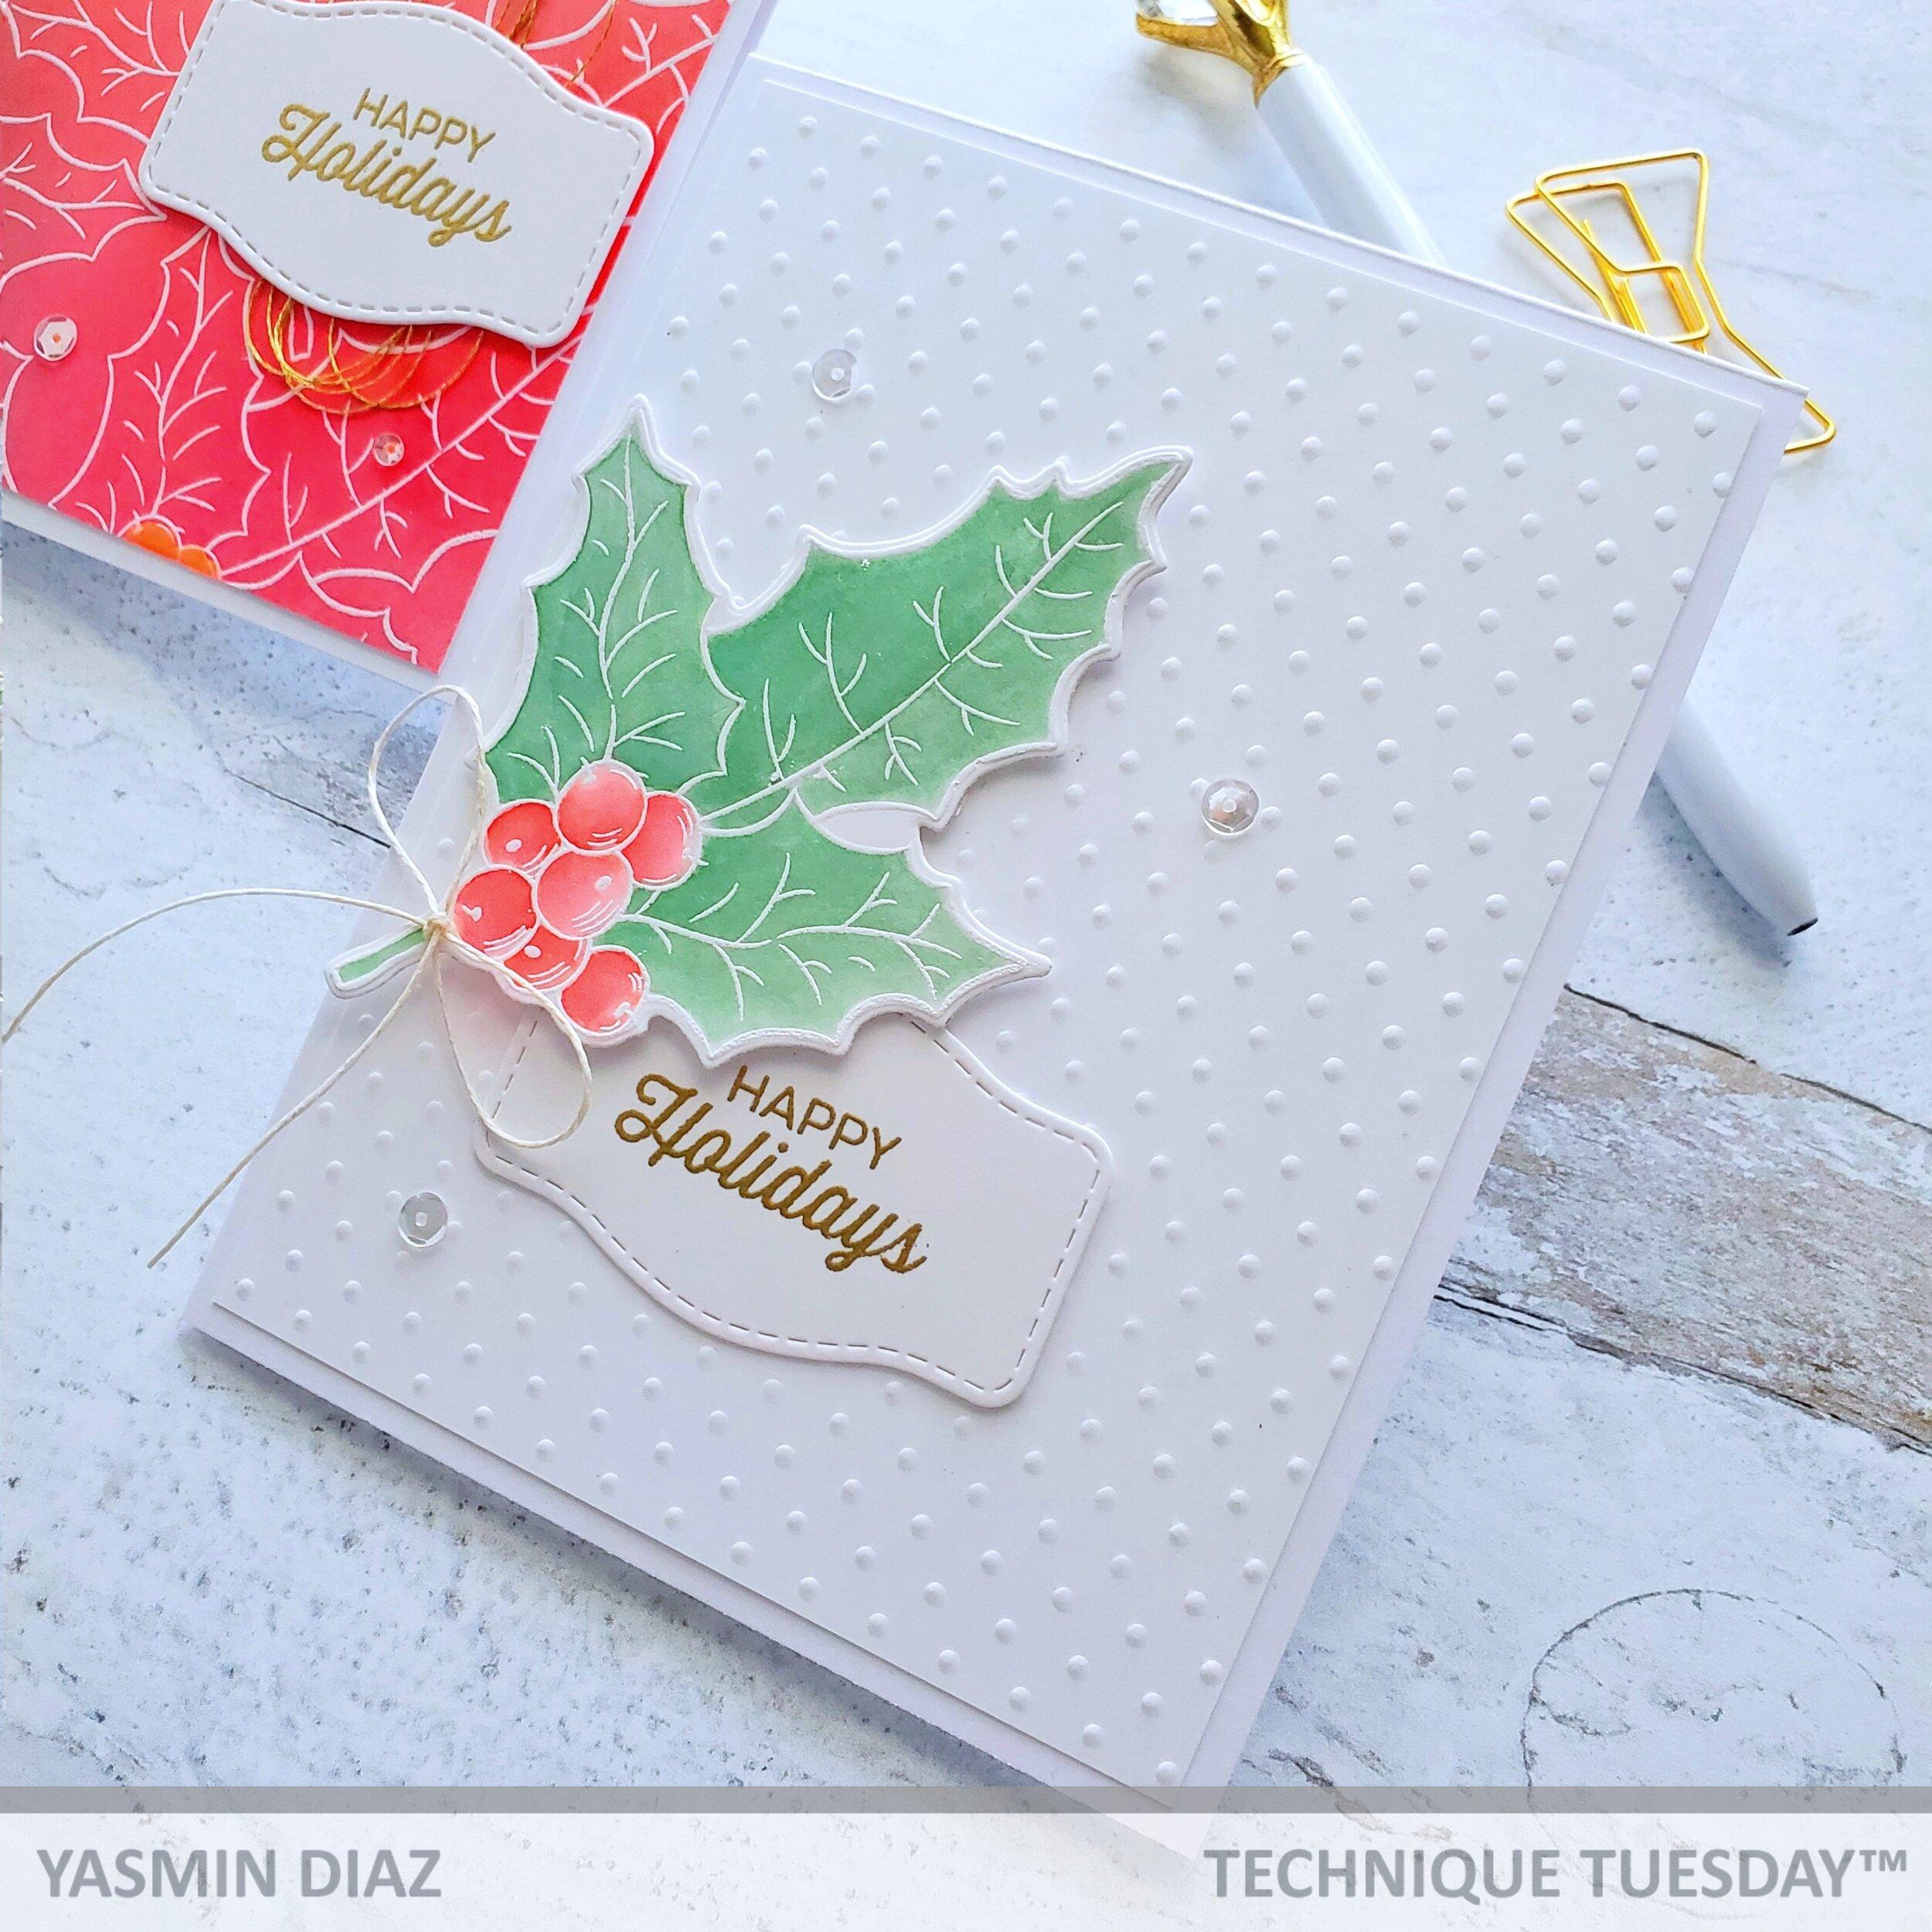 October-Yasmin-Diaz-Holly-Stamp-Cards-3.jpg